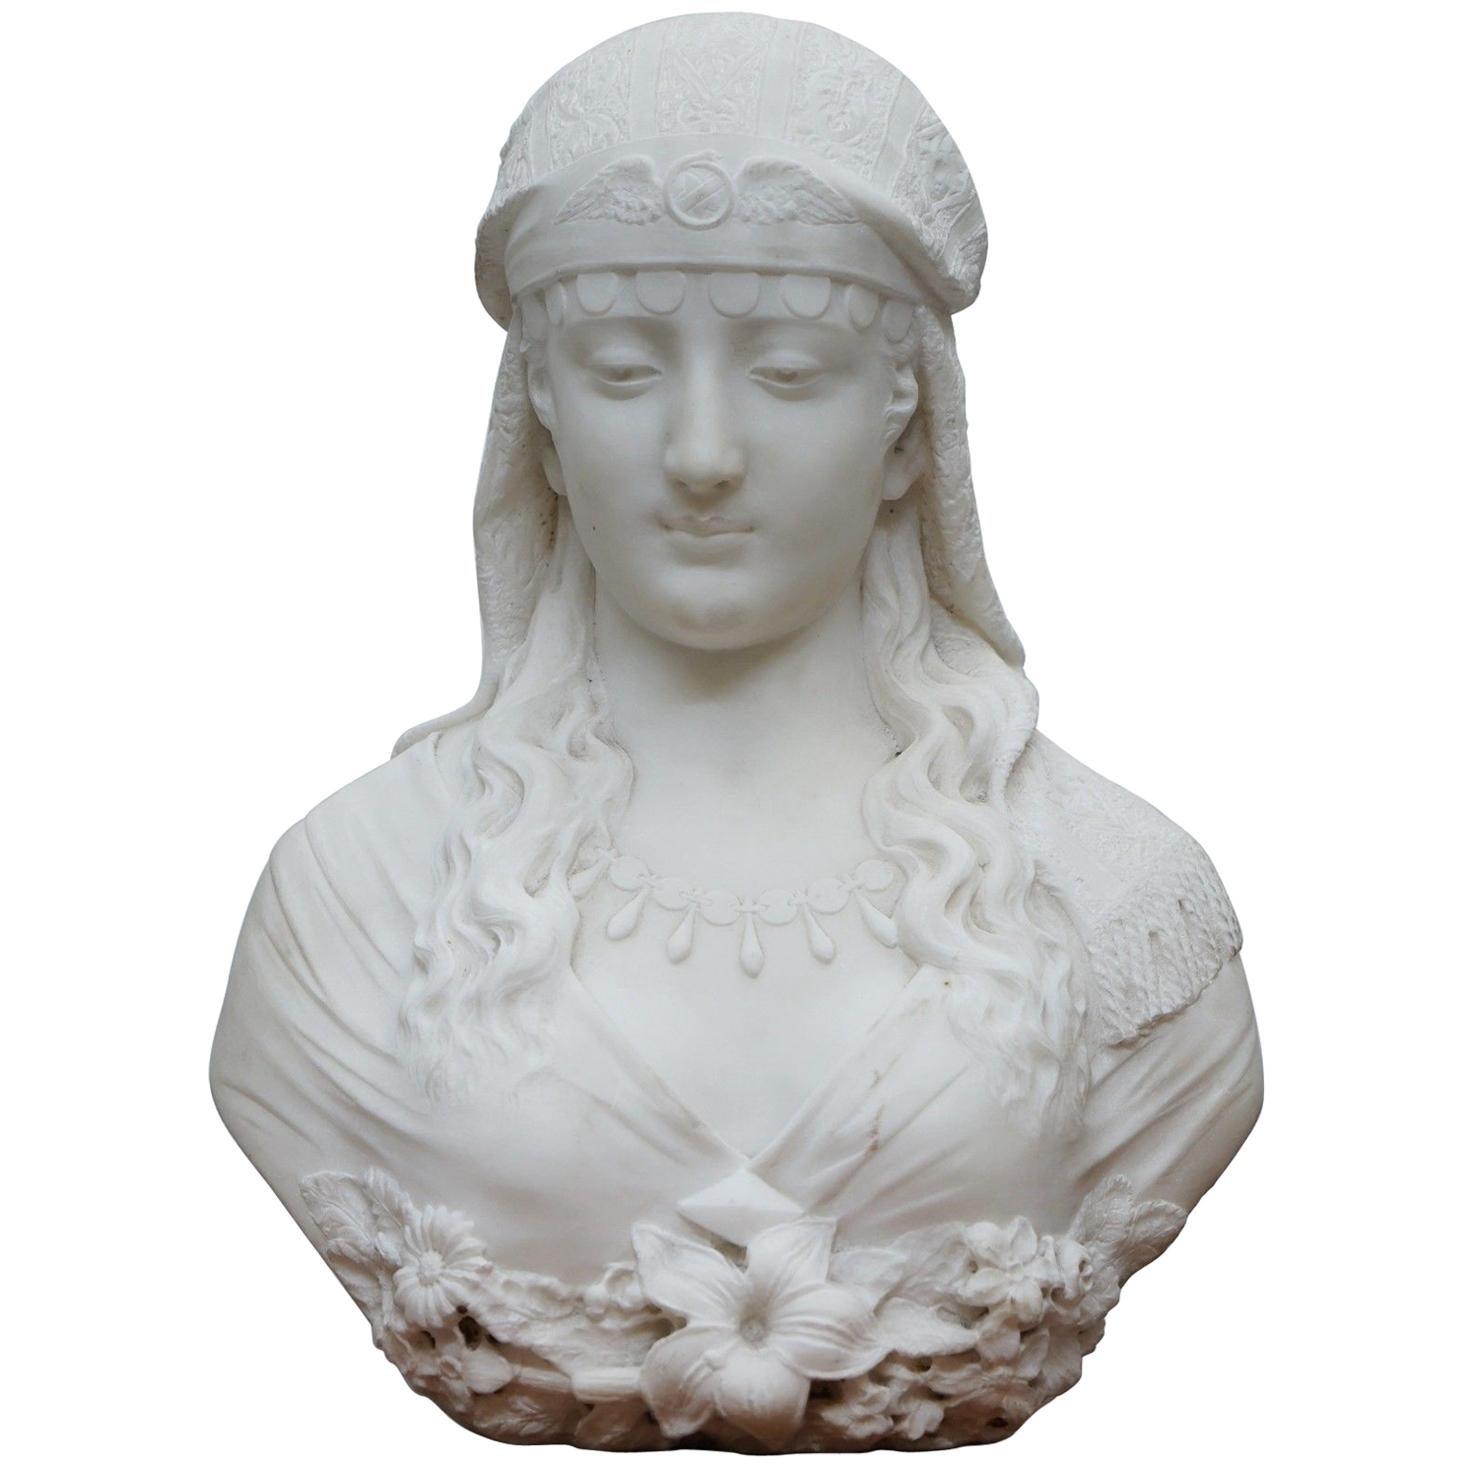 Original Ferdinando Vichi Italian 1875-1945 Marble Bust Egyptian Beauty Princess